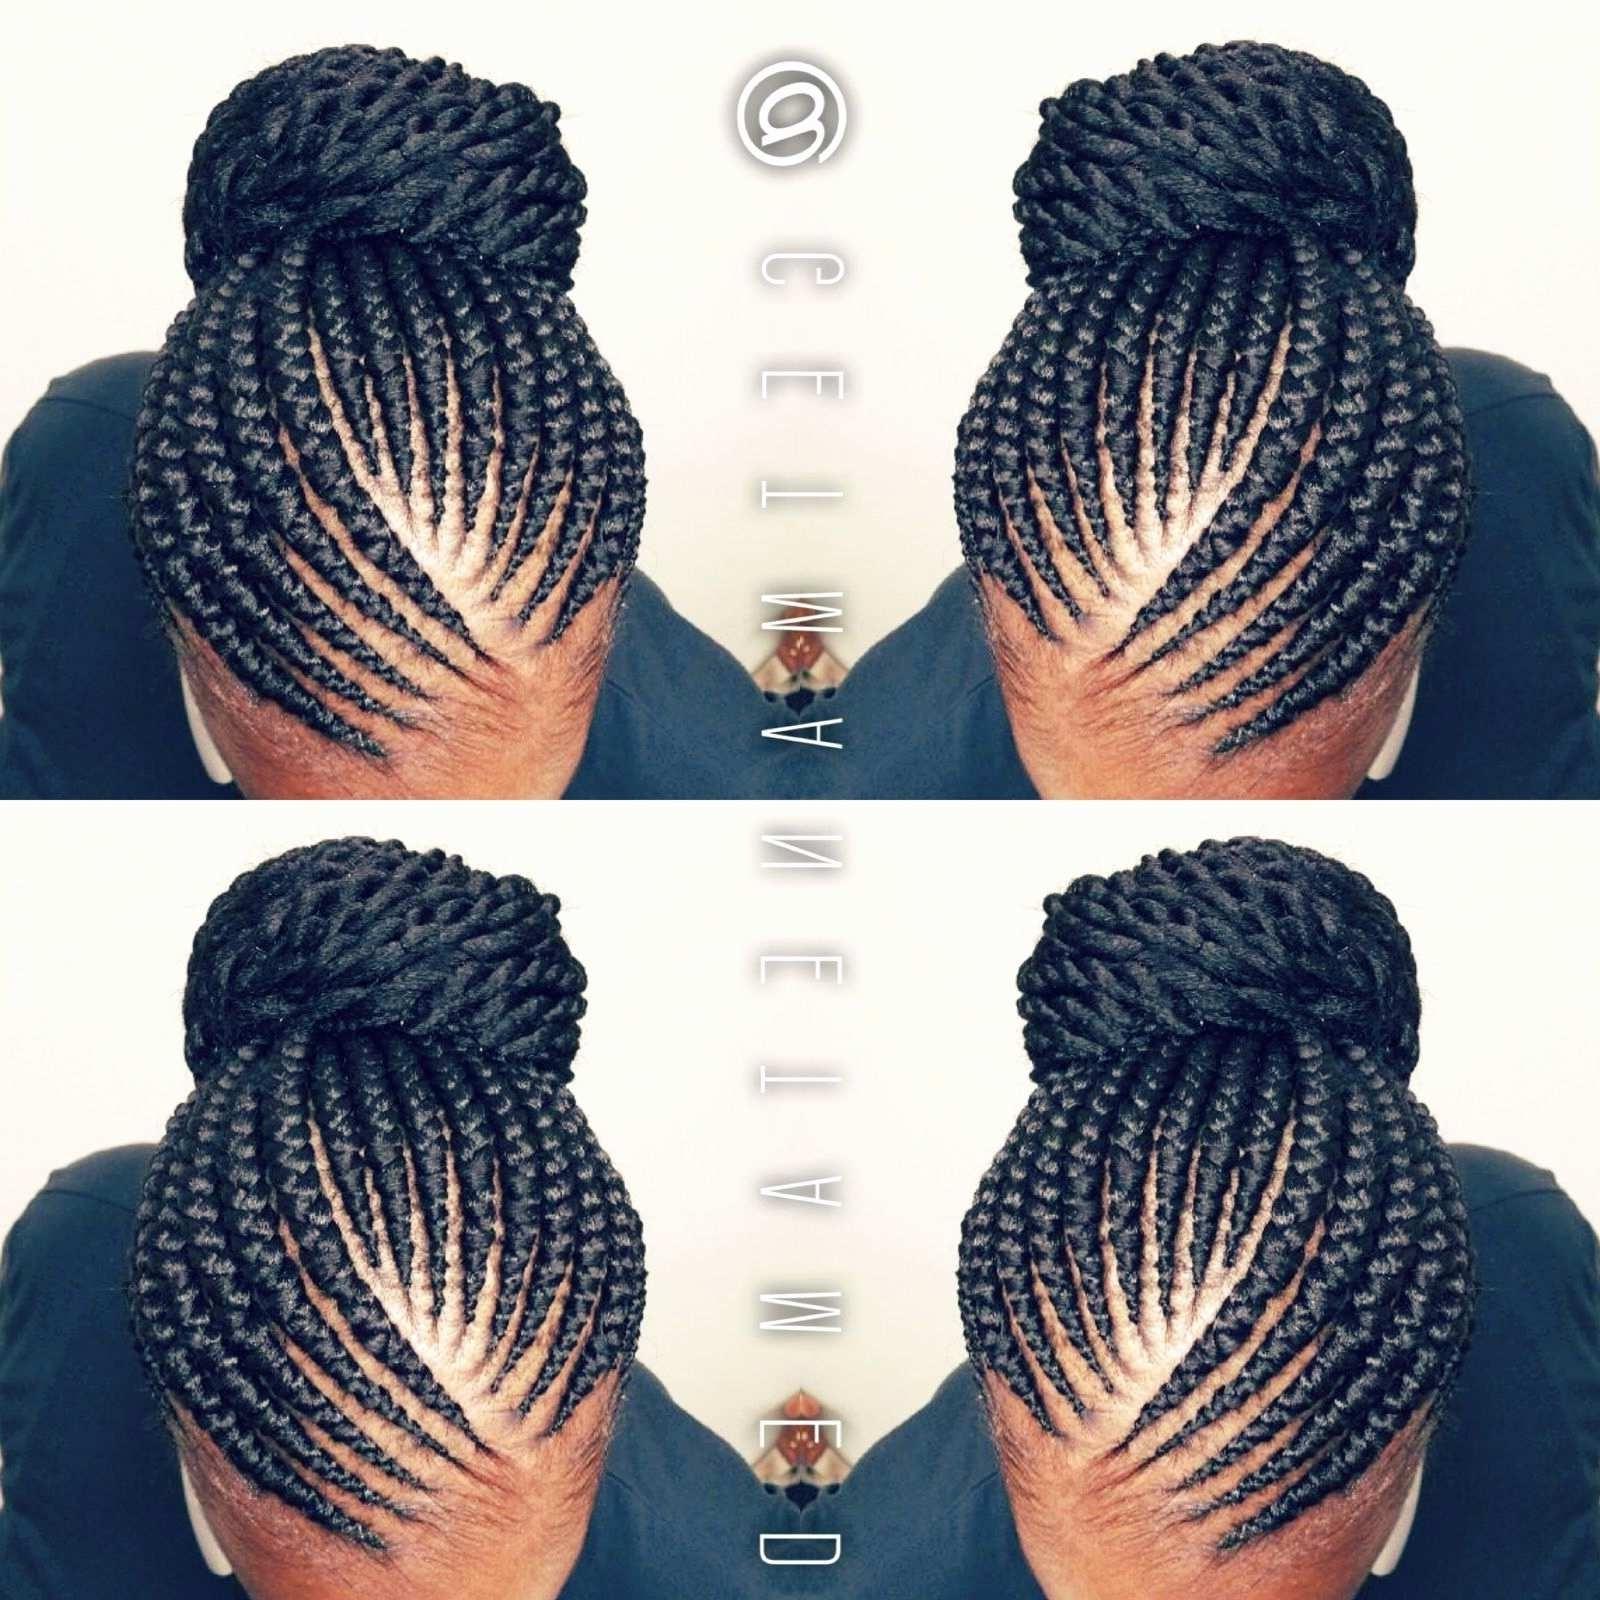 Braided Bun Hairstyles For Black Hair New Ghana Braids Ghana With Regard To Favorite Feed In Bun With Ghana Braids (View 12 of 15)